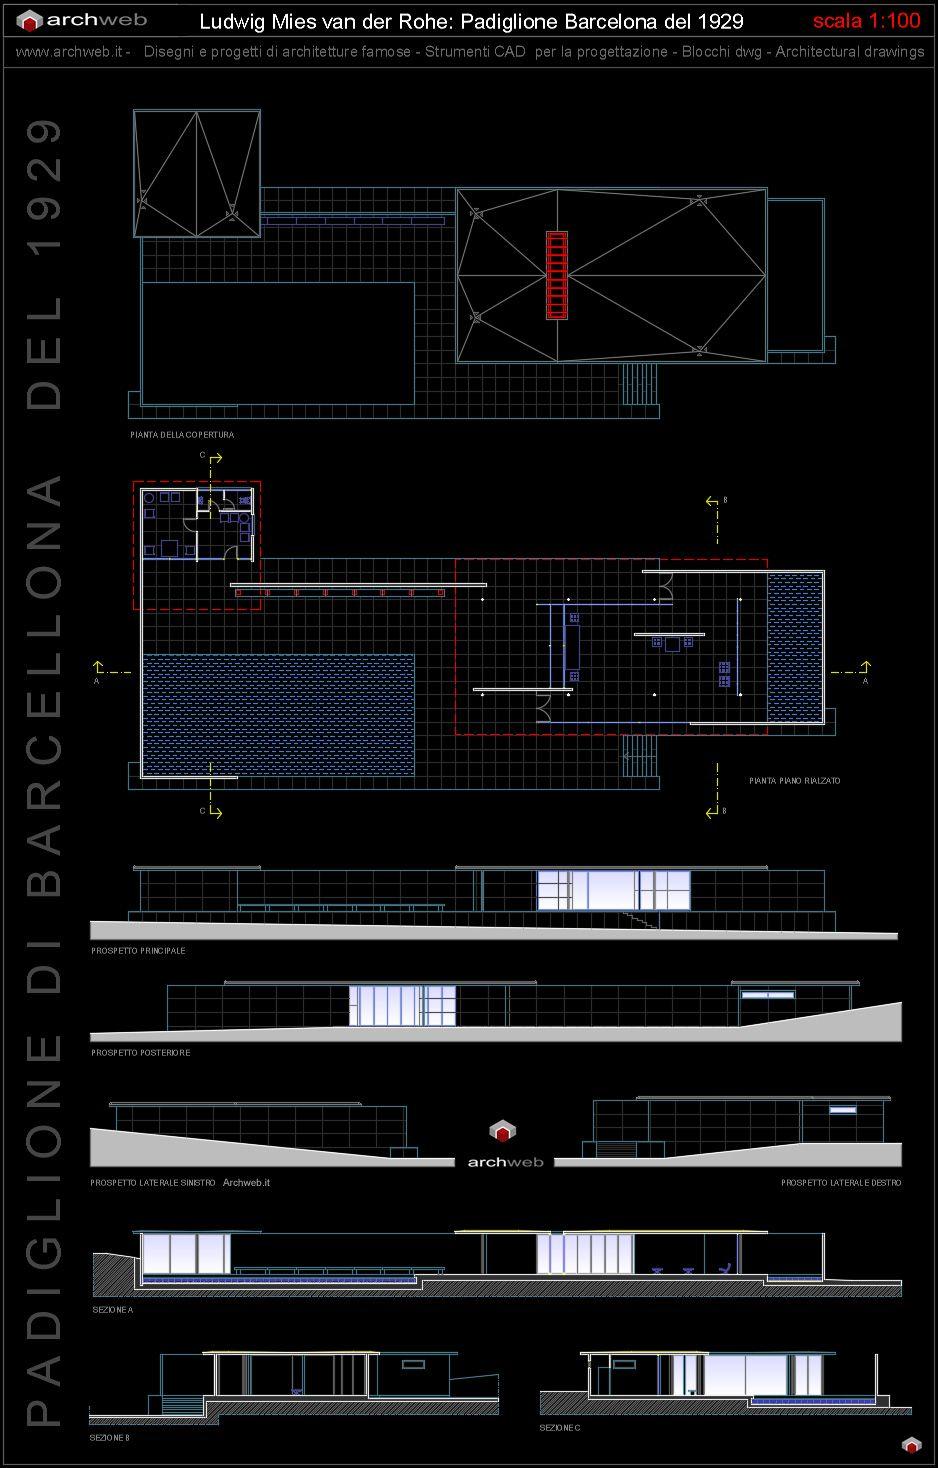 Padiglione Barcelona Autocad Dwg Barcelona Pavilion Pinterest  # Muebles Mies Van Der Rohe Autocad